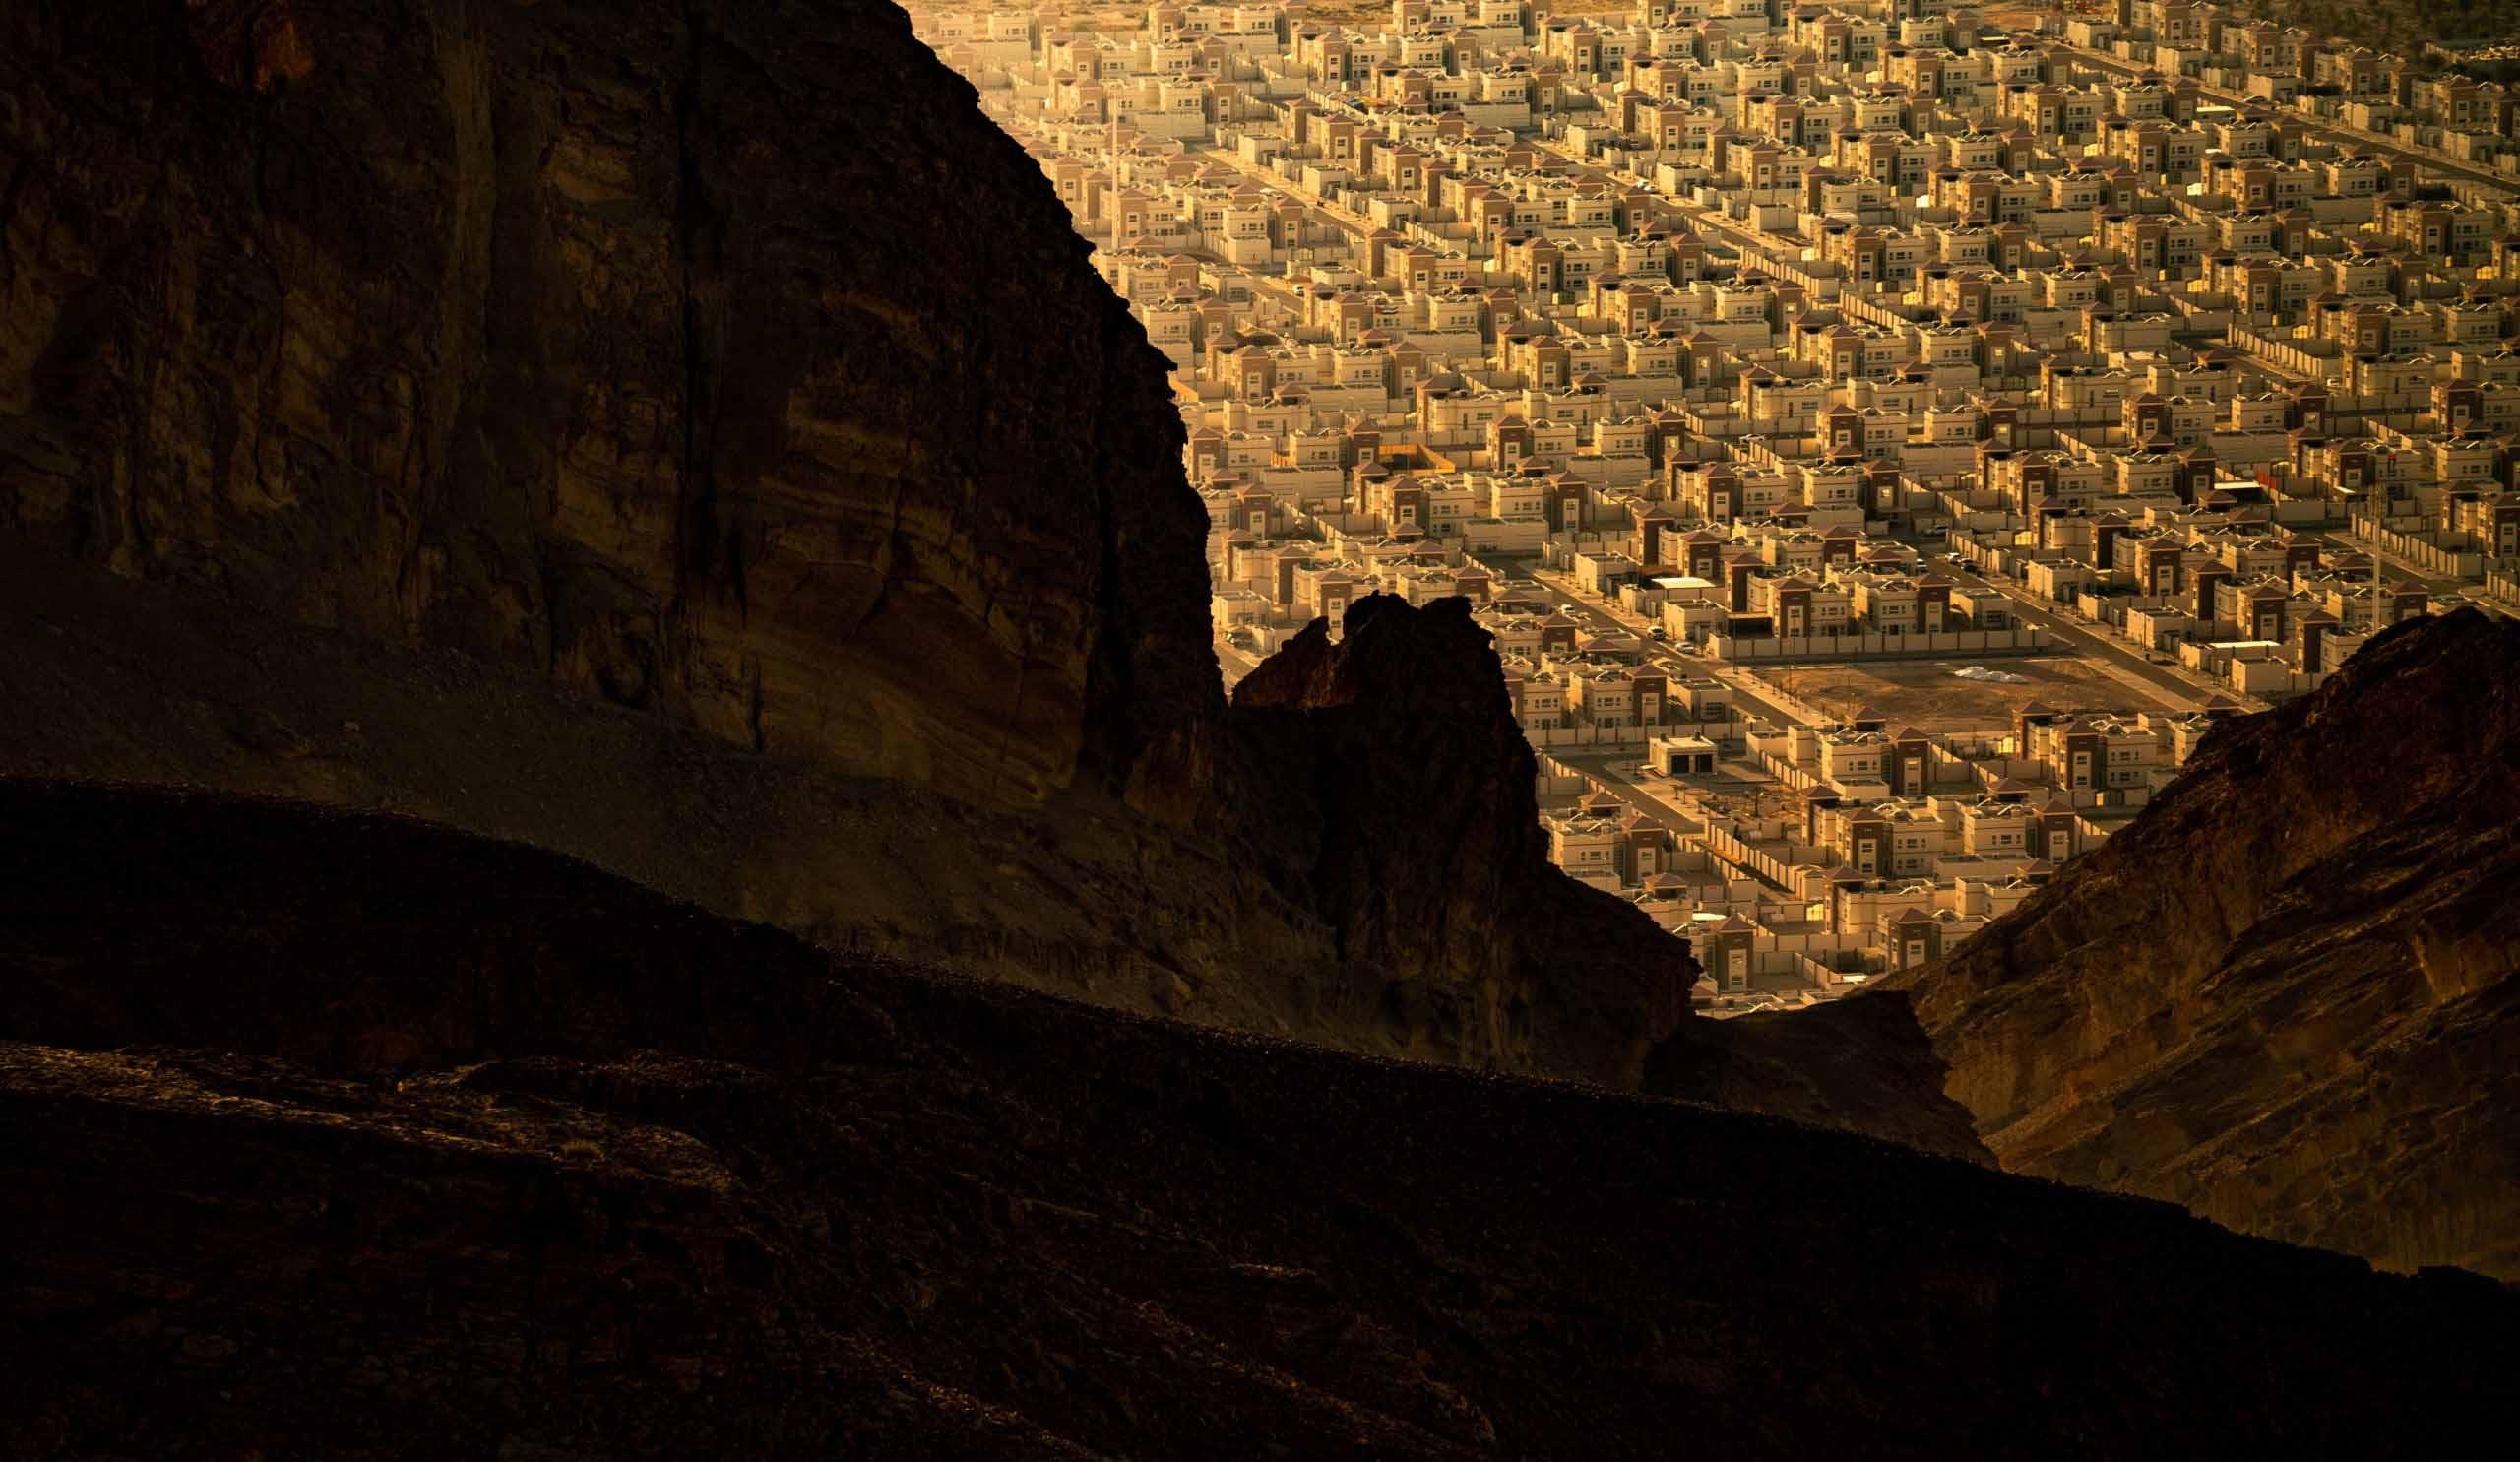 Stadt Al Ain in den Vereinigten Arabischen Emiraten